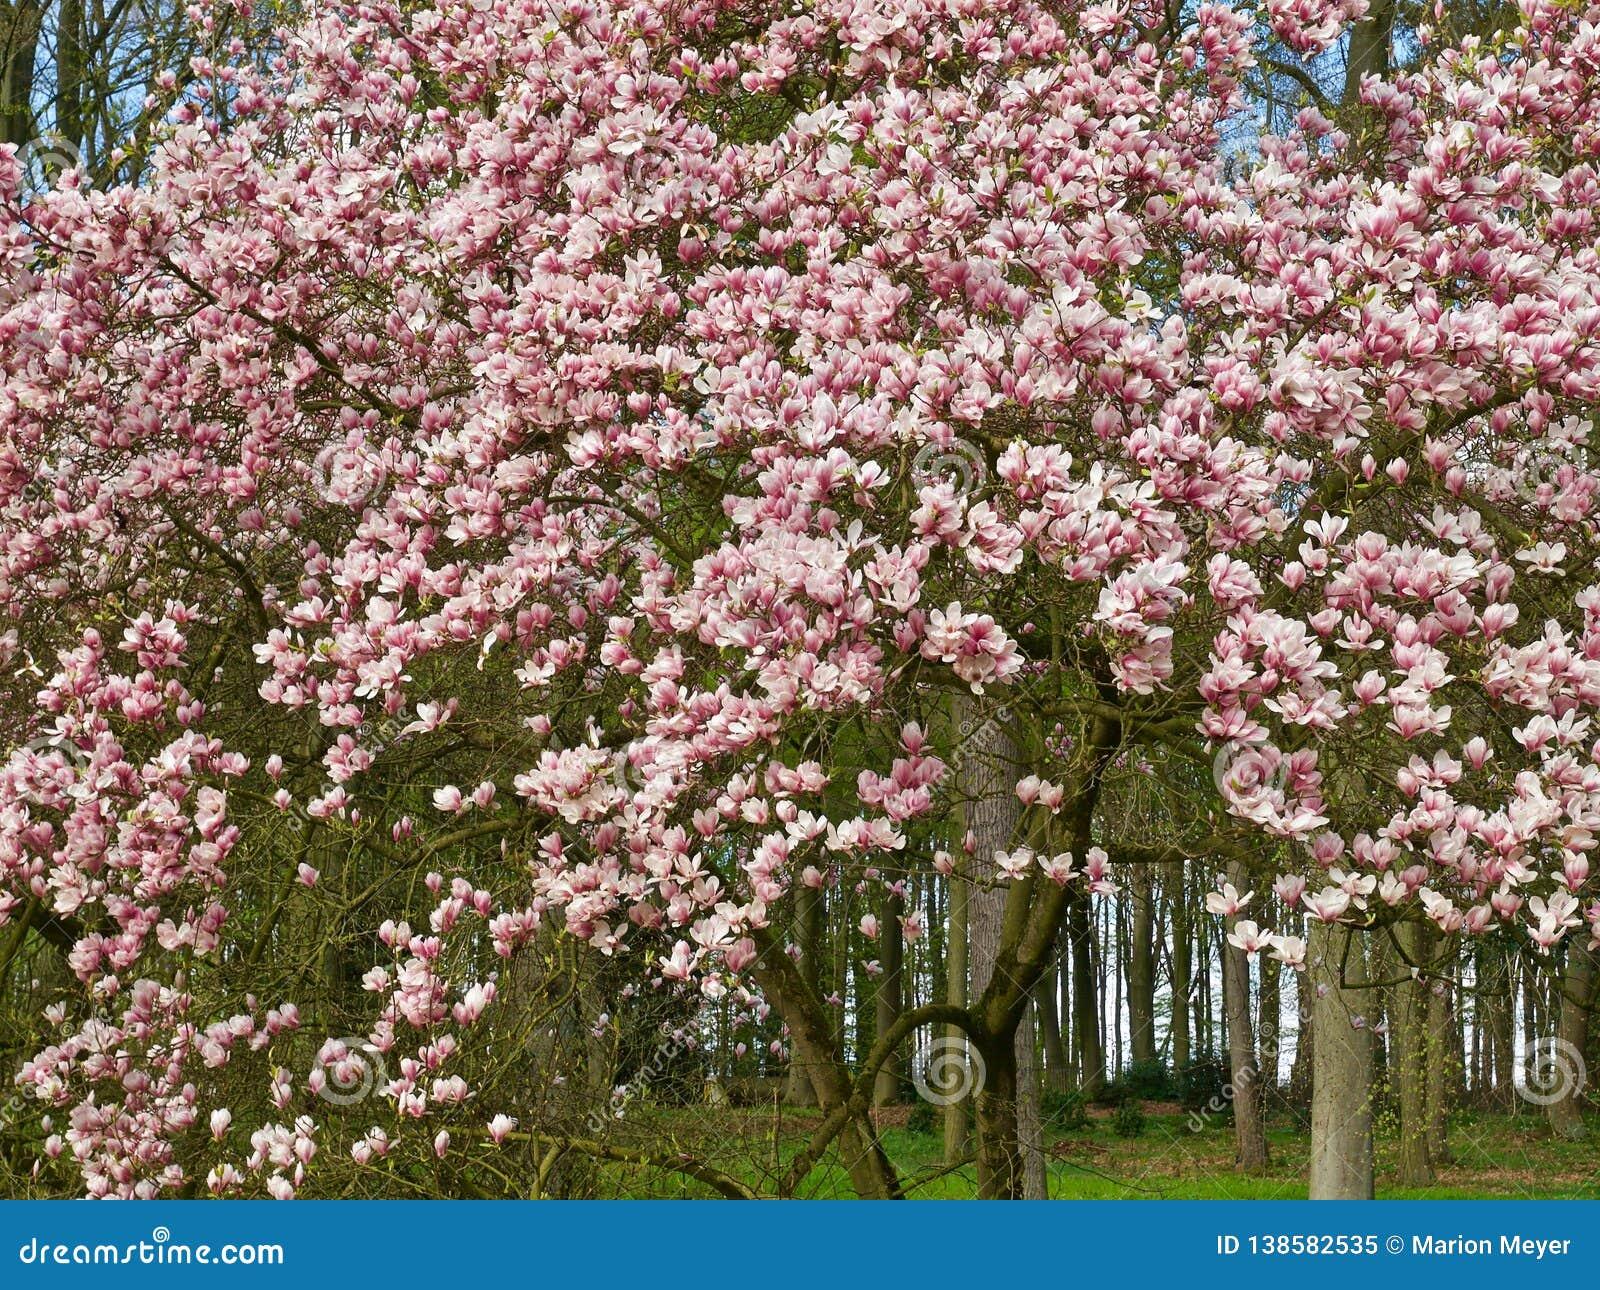 Huge Pink Blooming Magnolia Tree Stock Image Image Of Botany